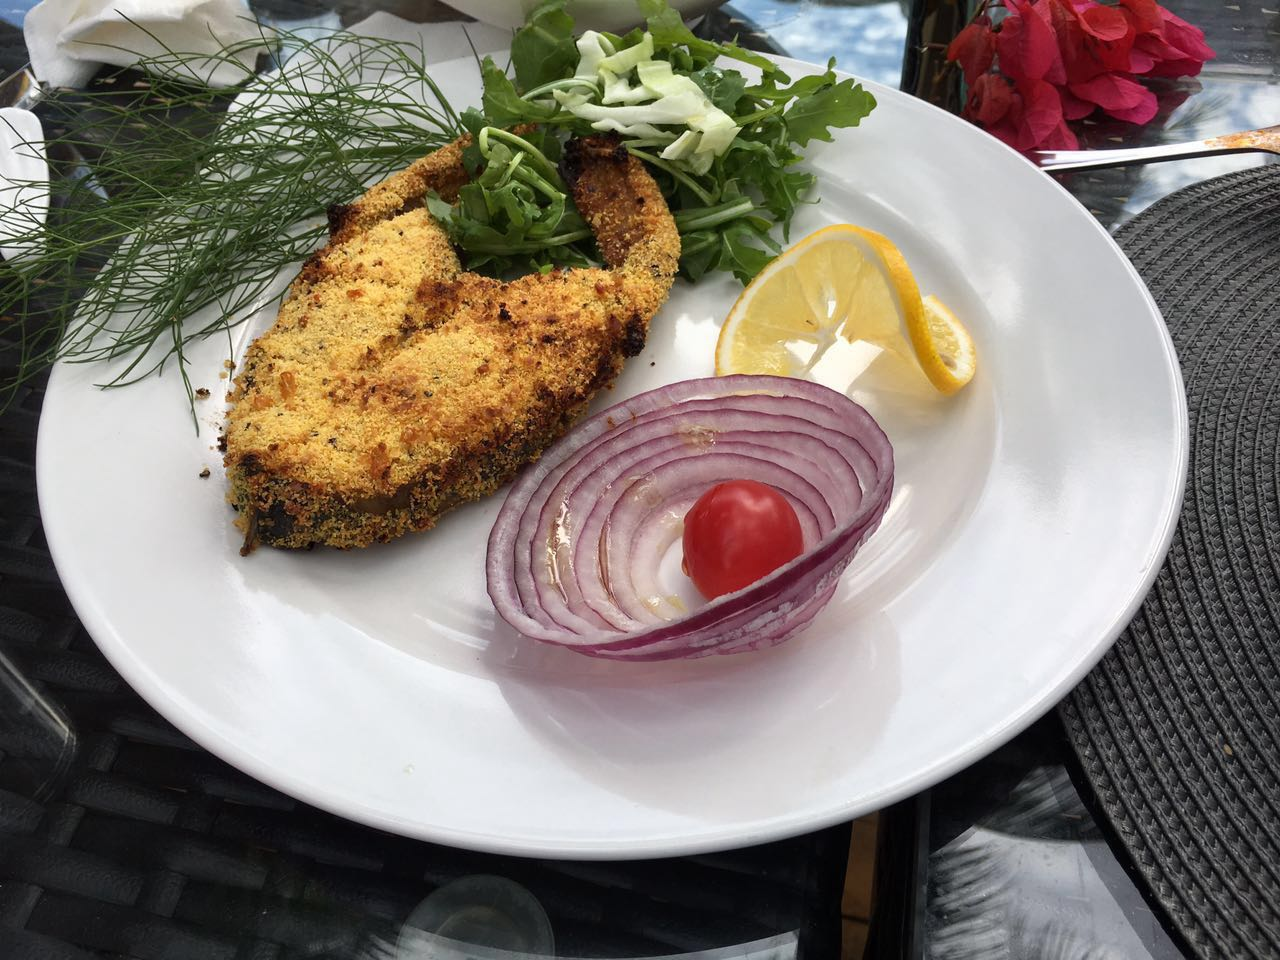 Scuola di cucina chef alessio milani in cina - Cucina in simpatia ...